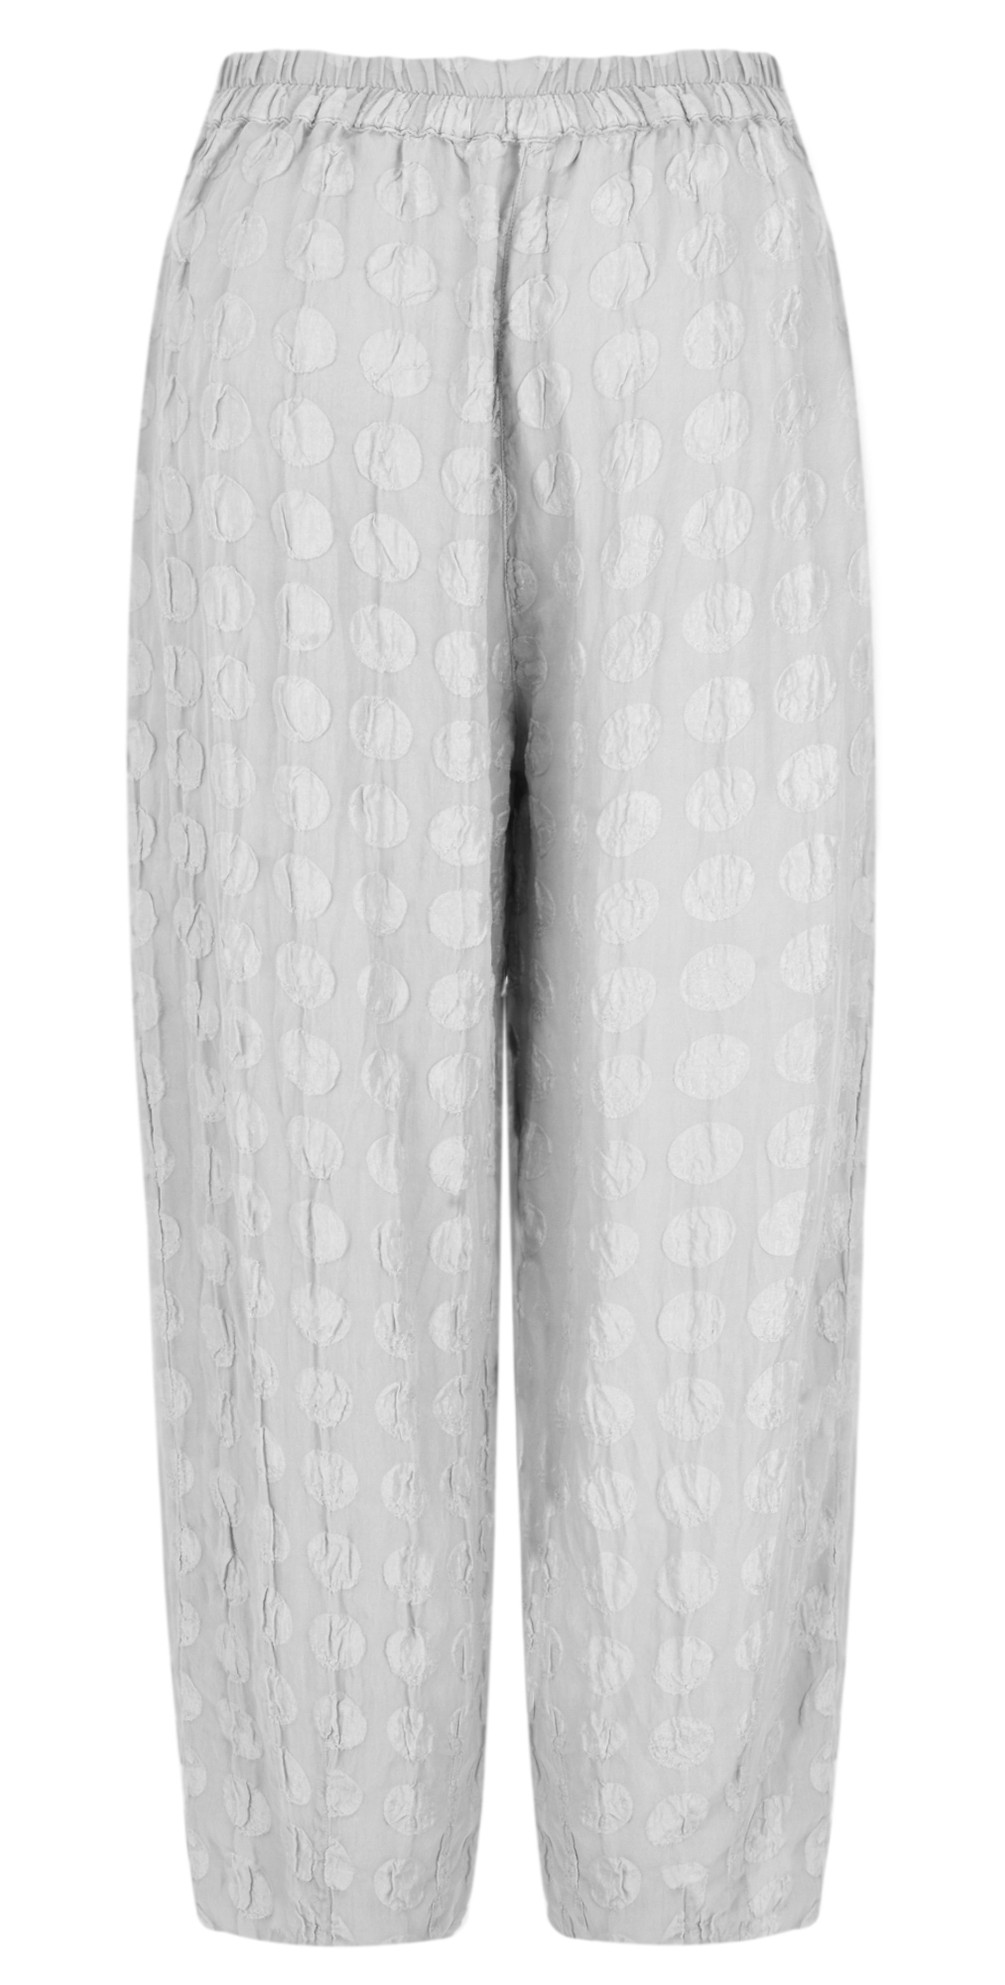 Aurinta Spot Trouser main image